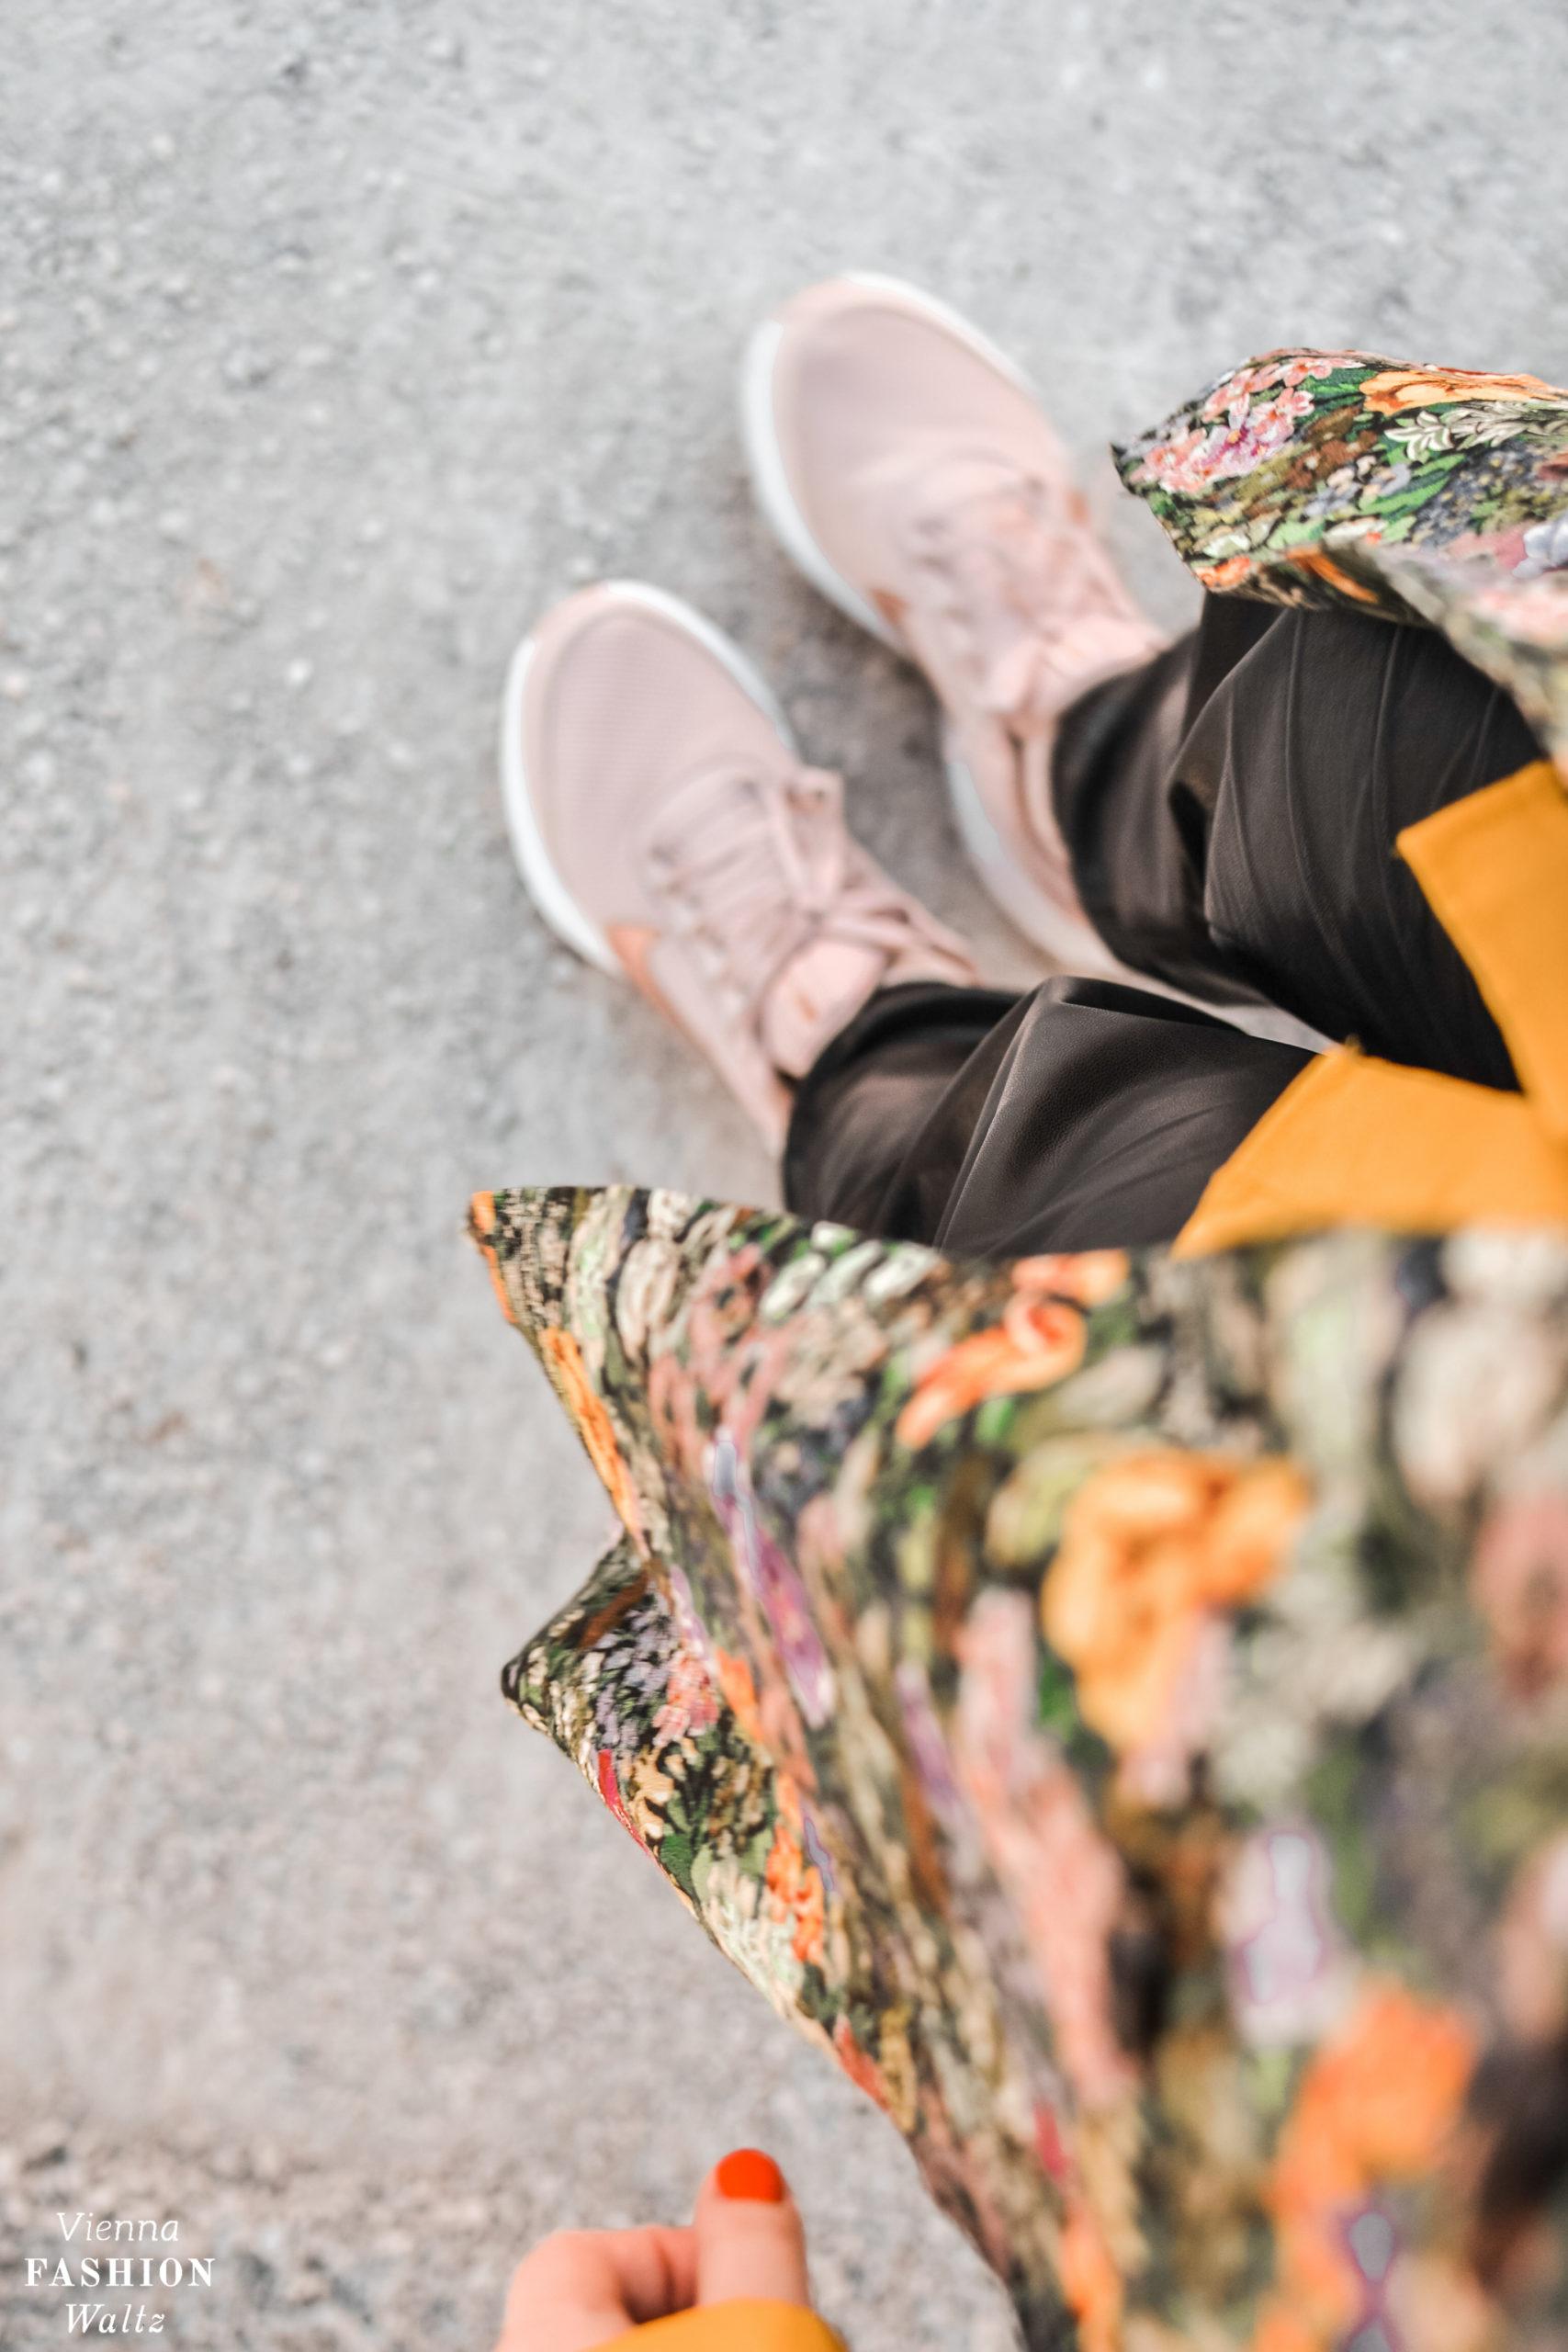 Fashiontrend Jogginghose aus Leder mit floralem Overshirt und Sneakers